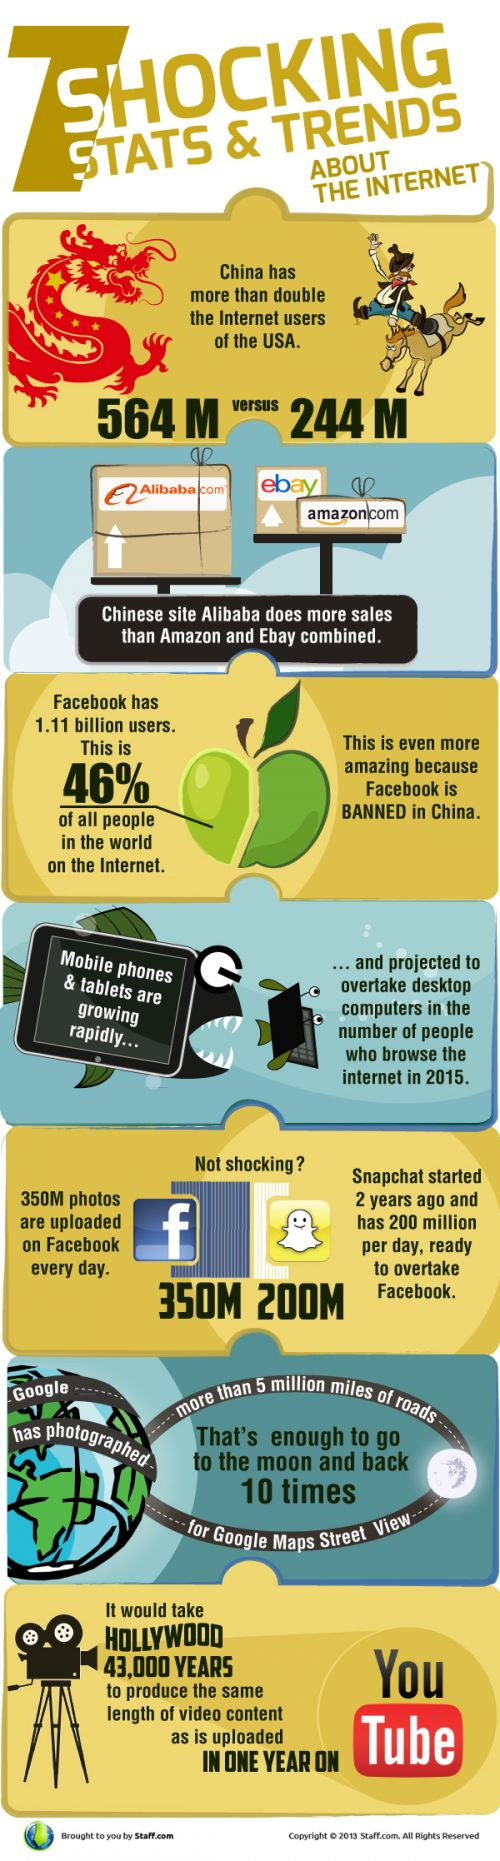 7 shocking stats wcreditsv1 500x1861 7 Shocking Internet Trends & Stats – Infographic